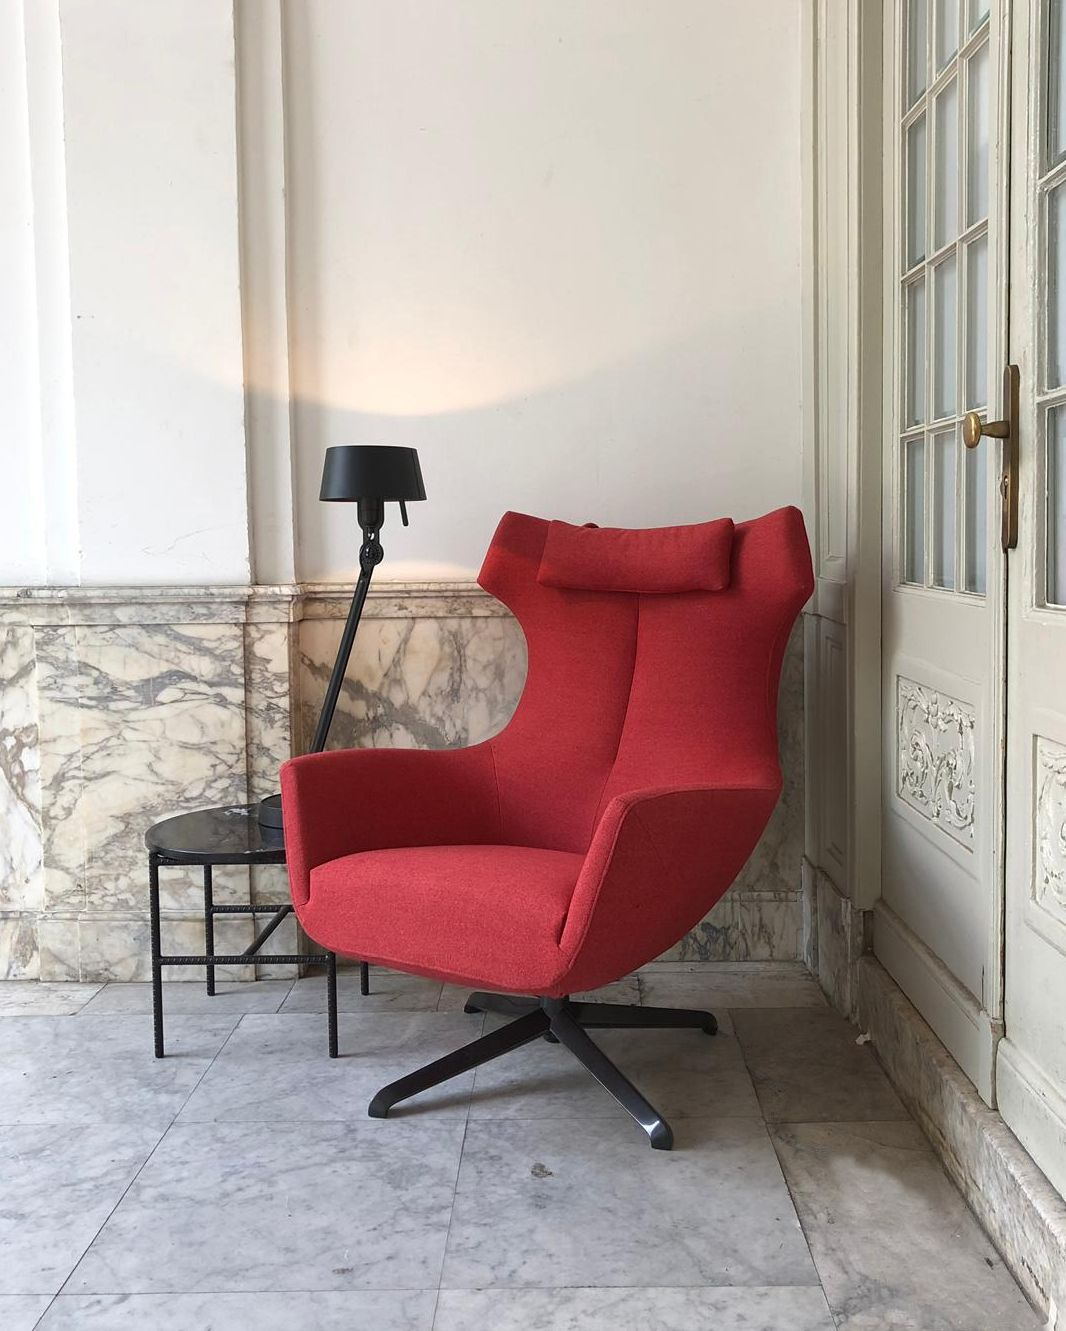 Design Meubels Eindhoven.Design On Stock Nosto Fauteuil Poef Fauteuil Design En